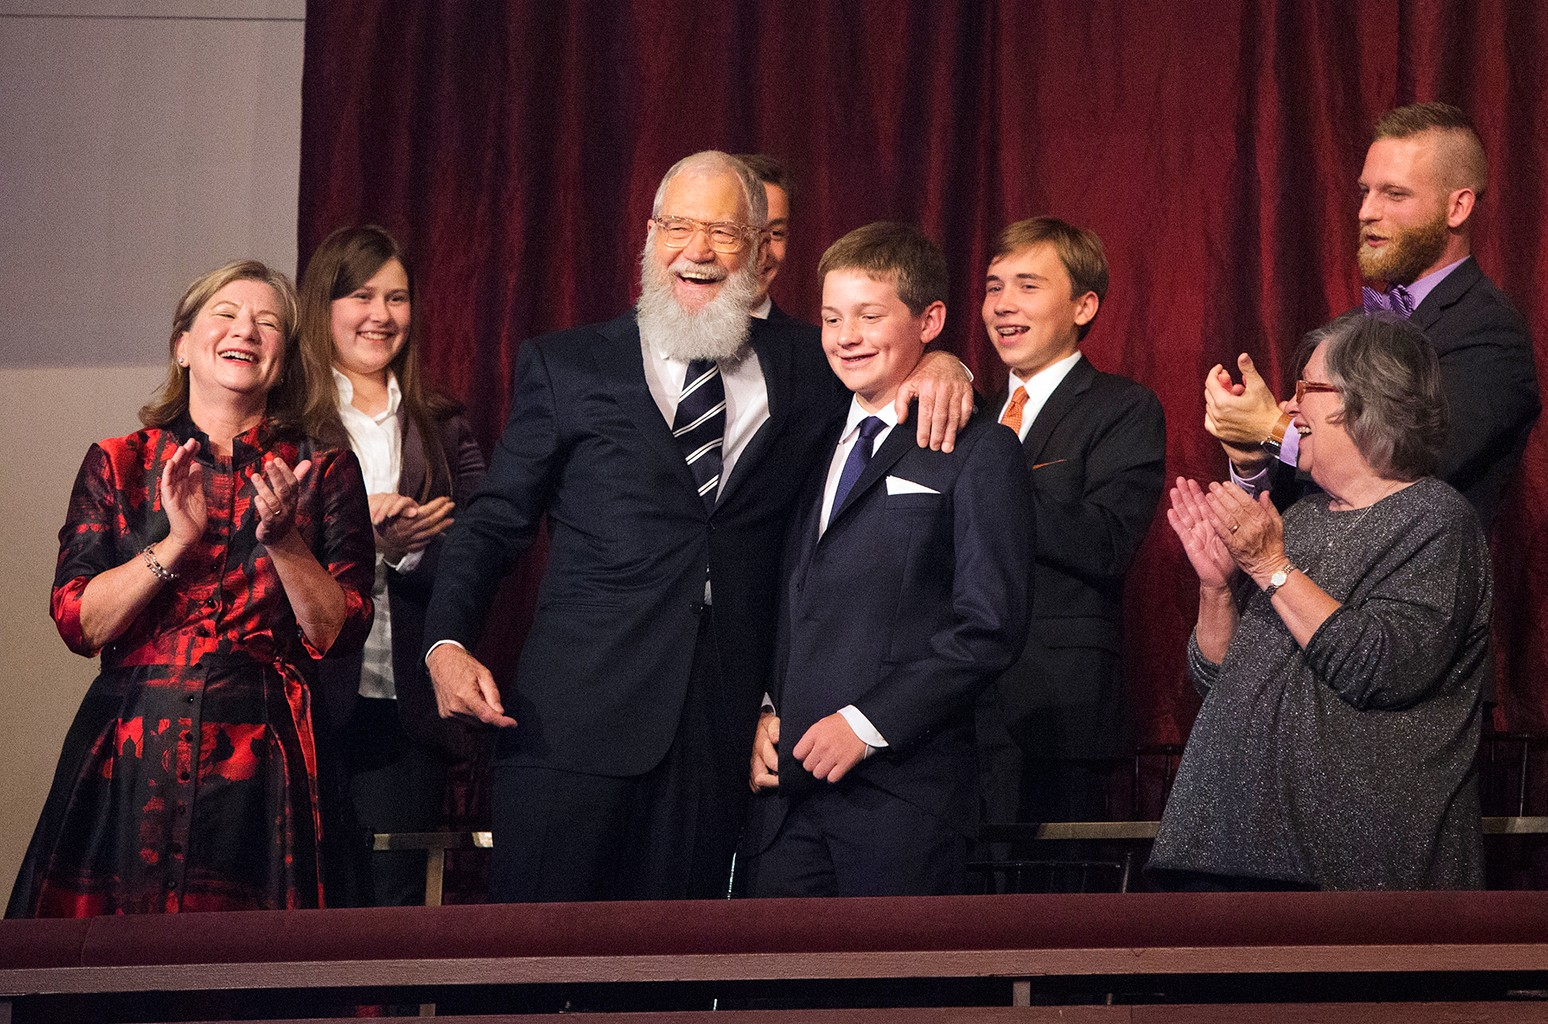 David Letterman, 2017